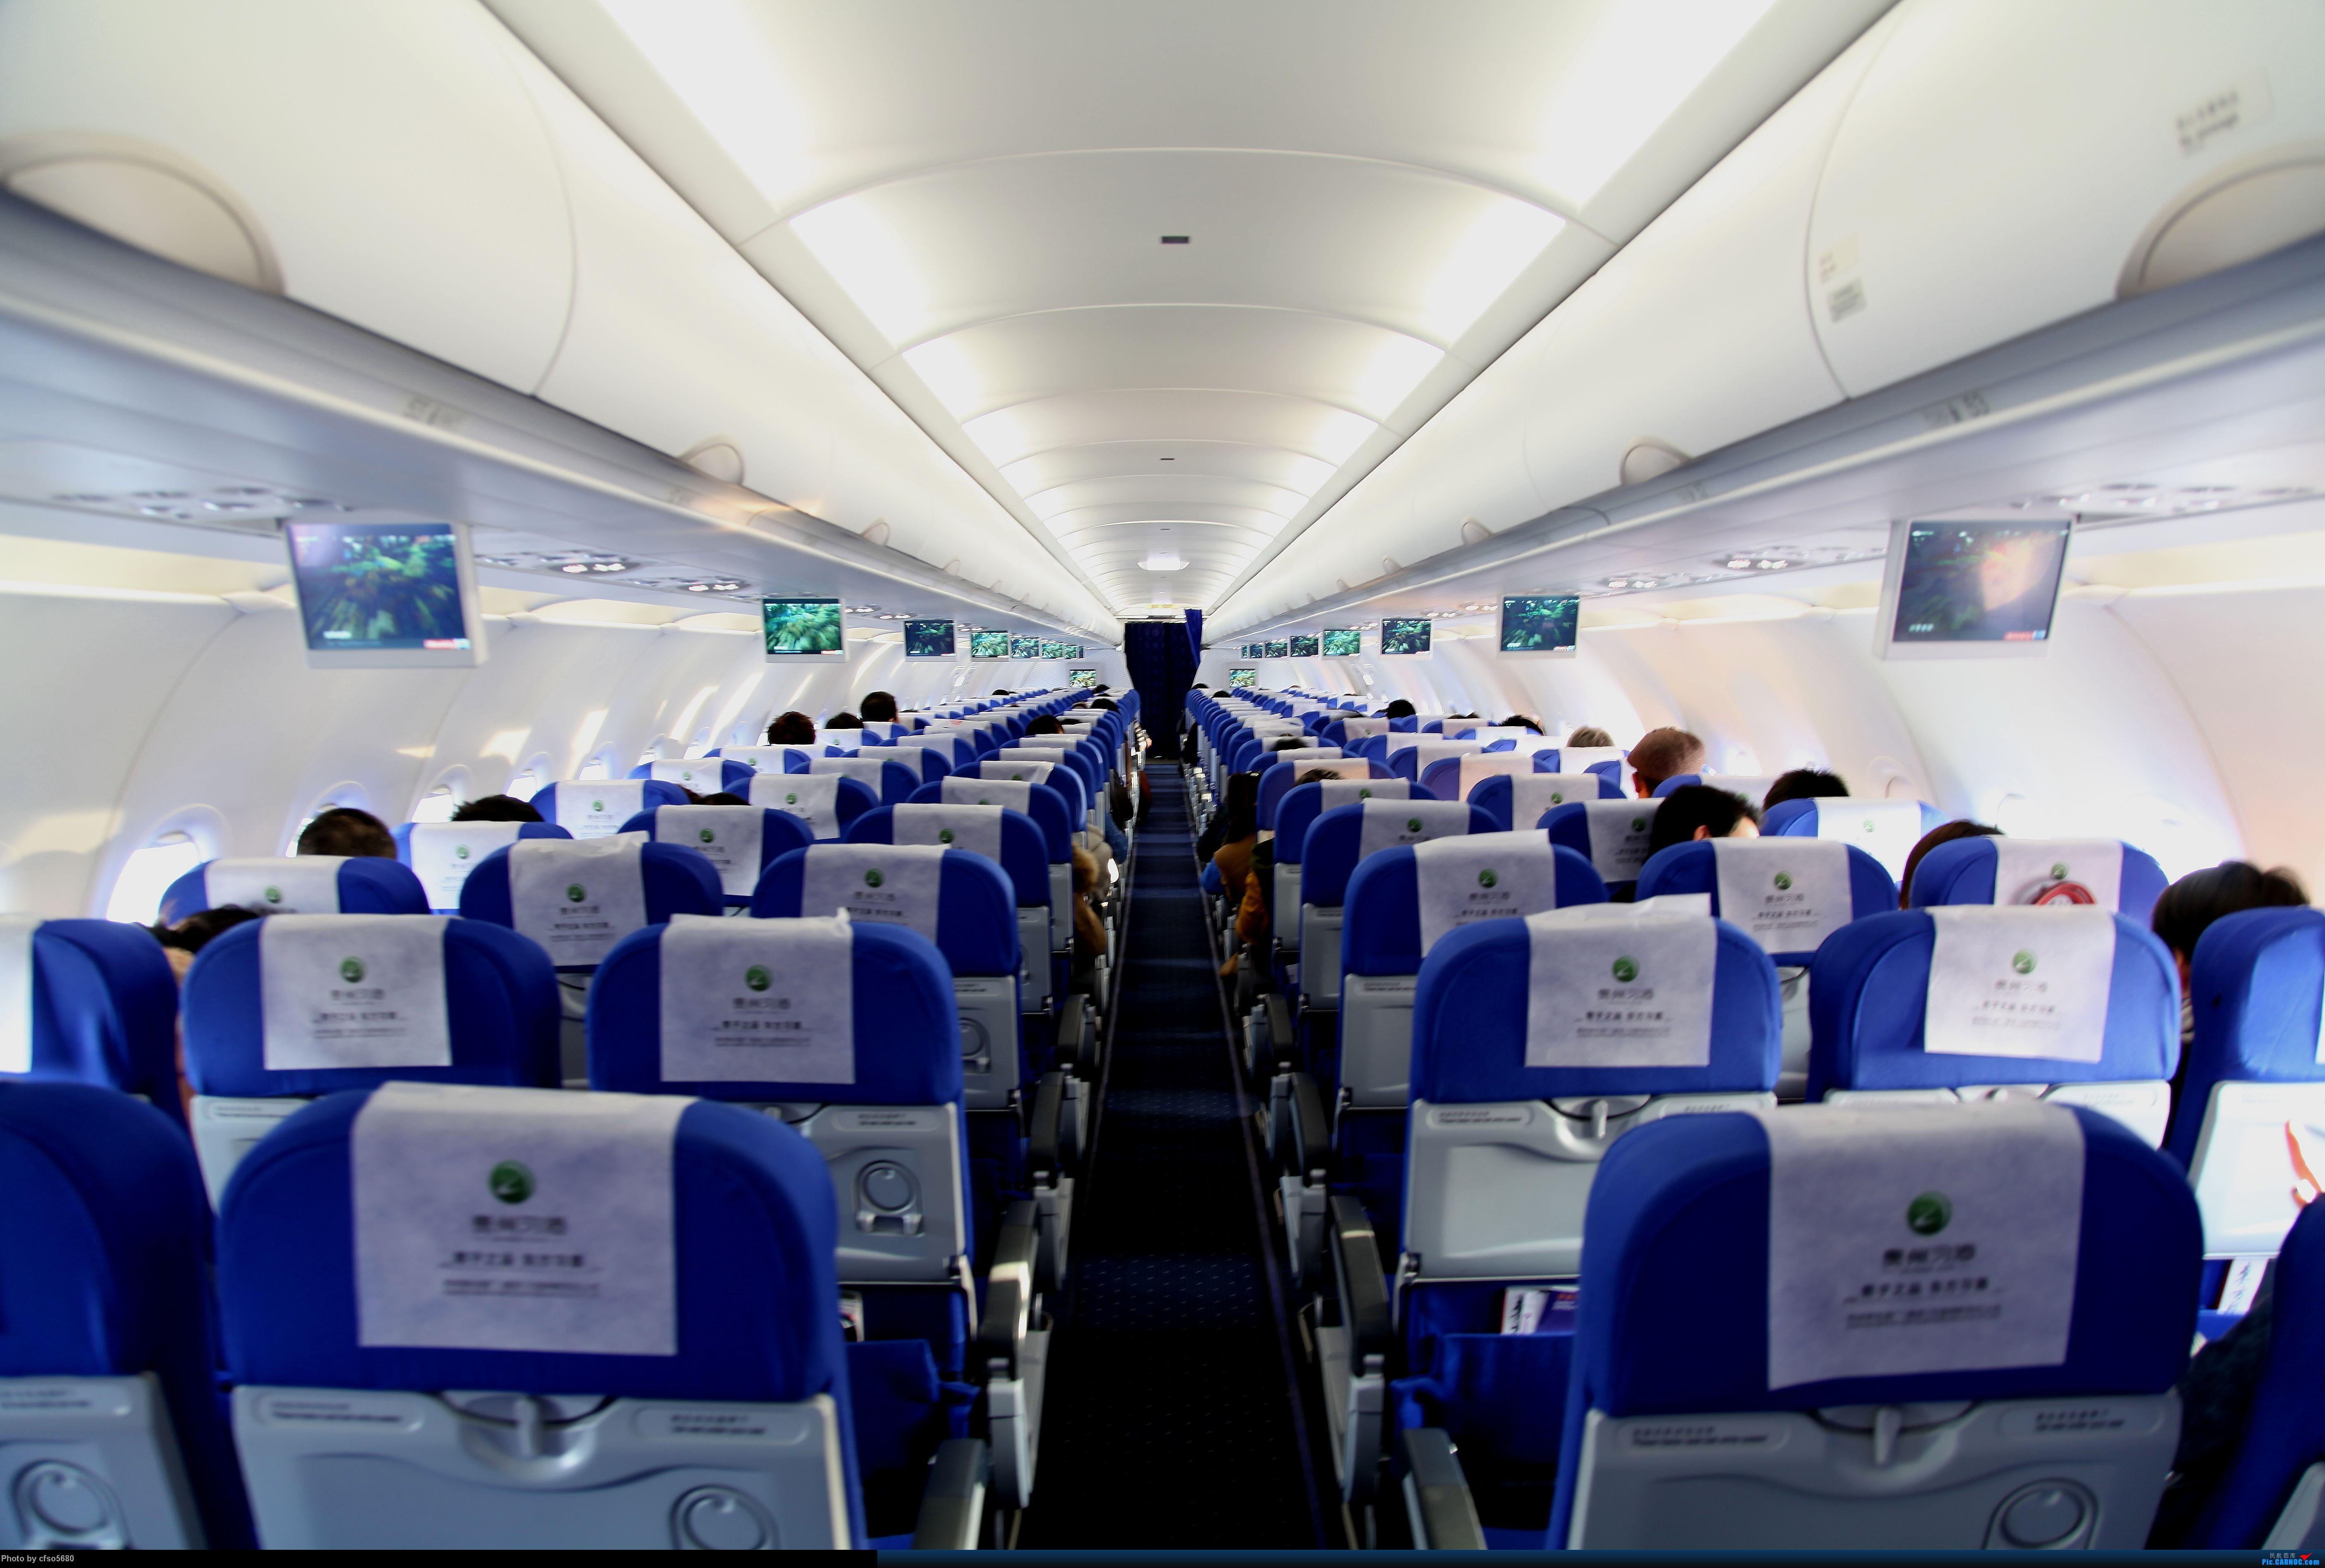 Re:[原创]2013大马拍机之旅,有彩绘、有380,飞机多多,惊喜多多。 AIRBUS A320-200 B-6829 徐州观音机场